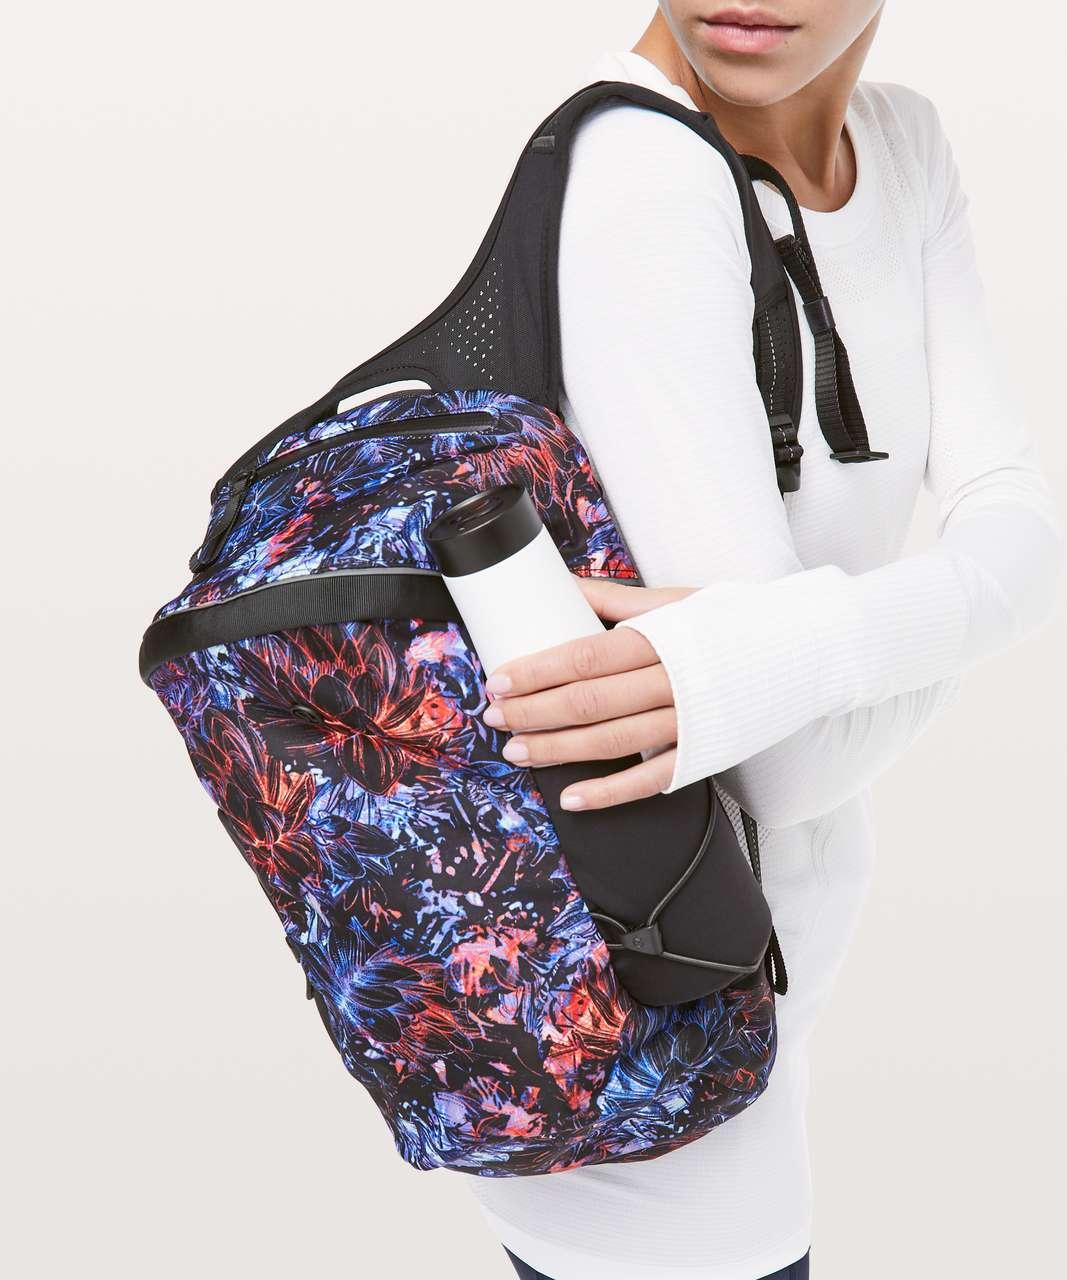 Lululemon Run All Day Backpack II *13L - Neon Blossom Multi